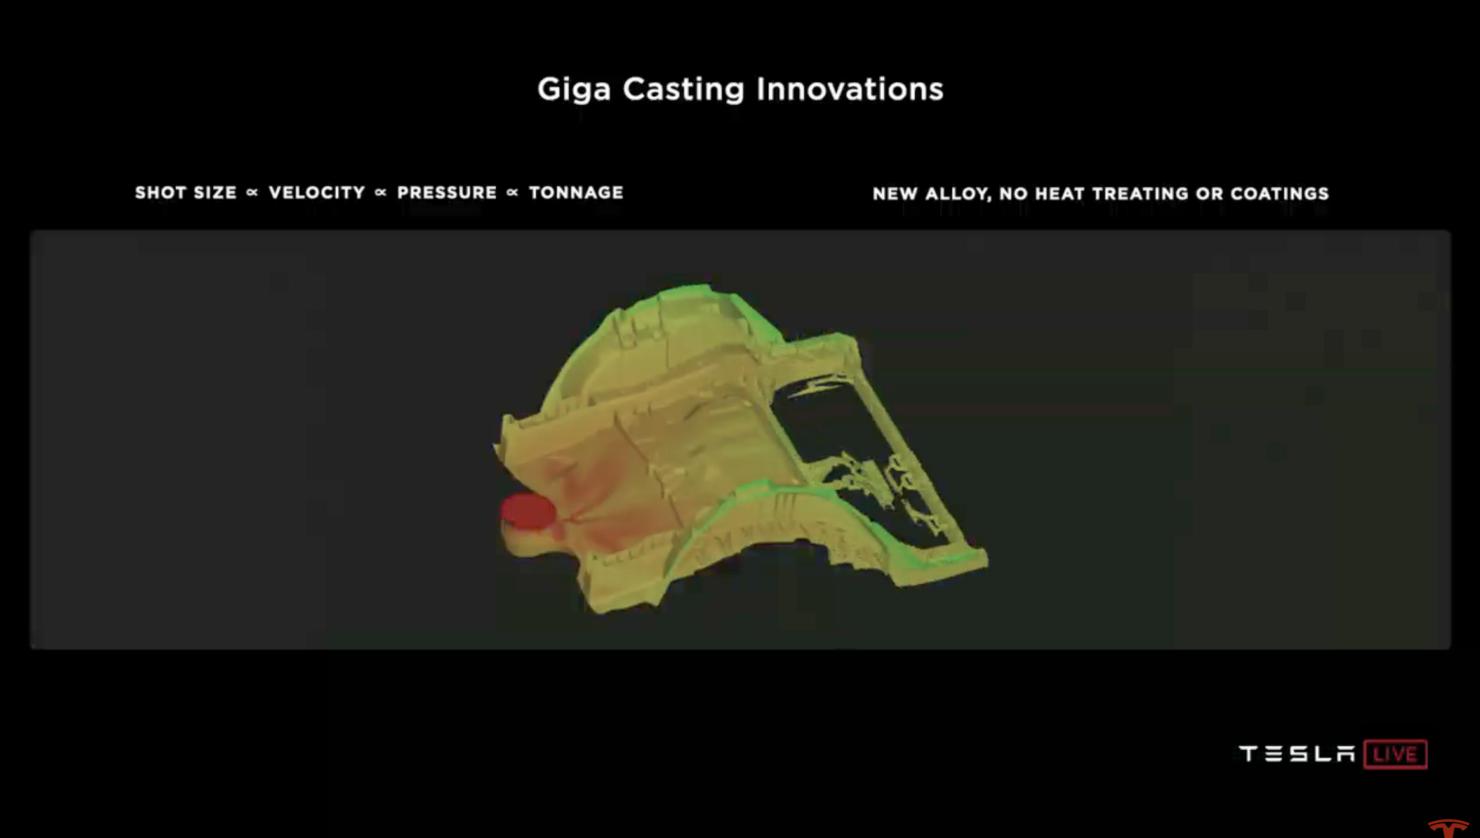 Tesla manufacturing single pice parts